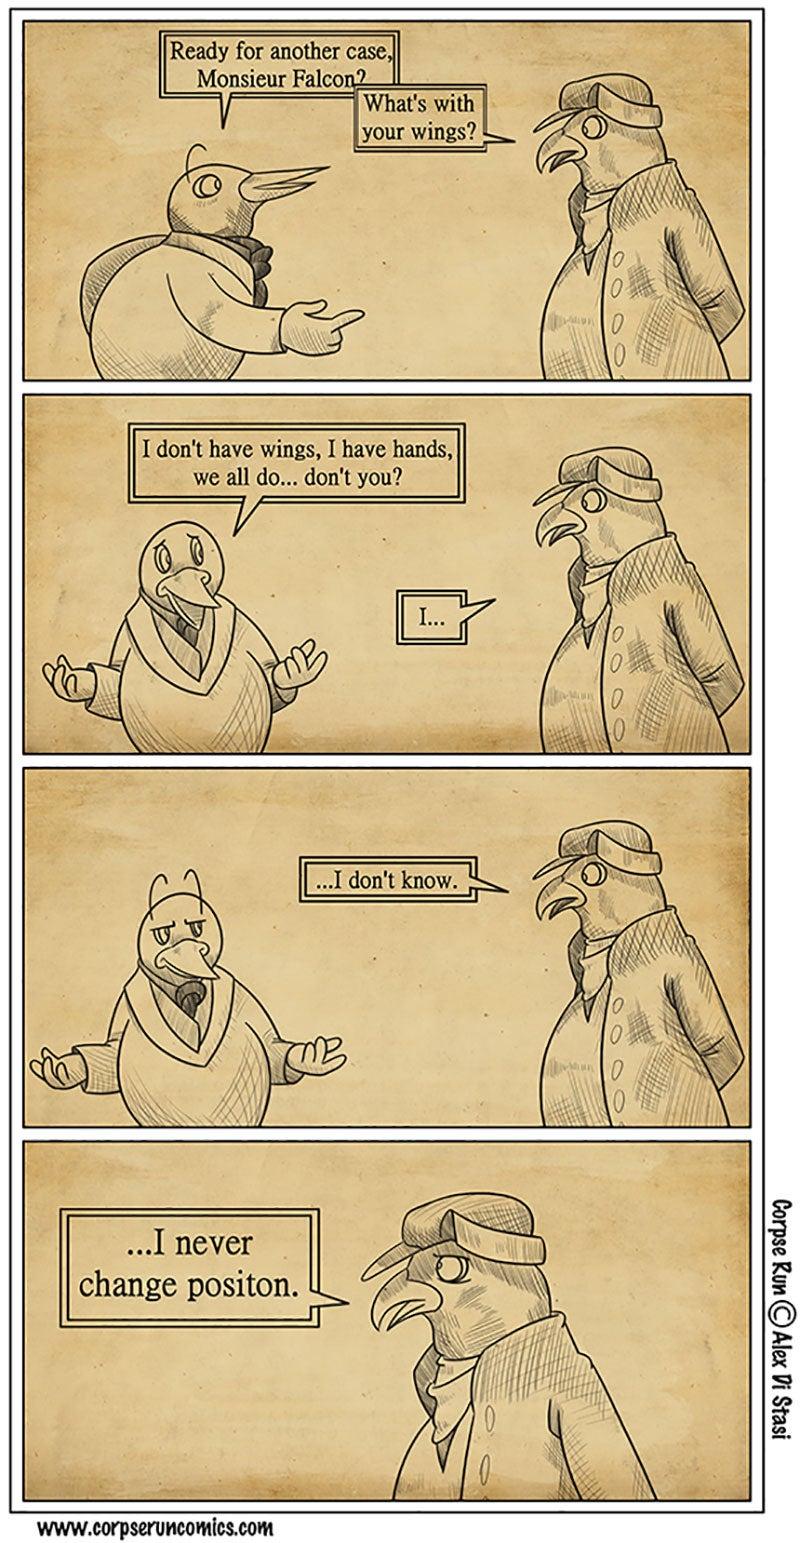 Sunday Comics: Essential Death Lessons